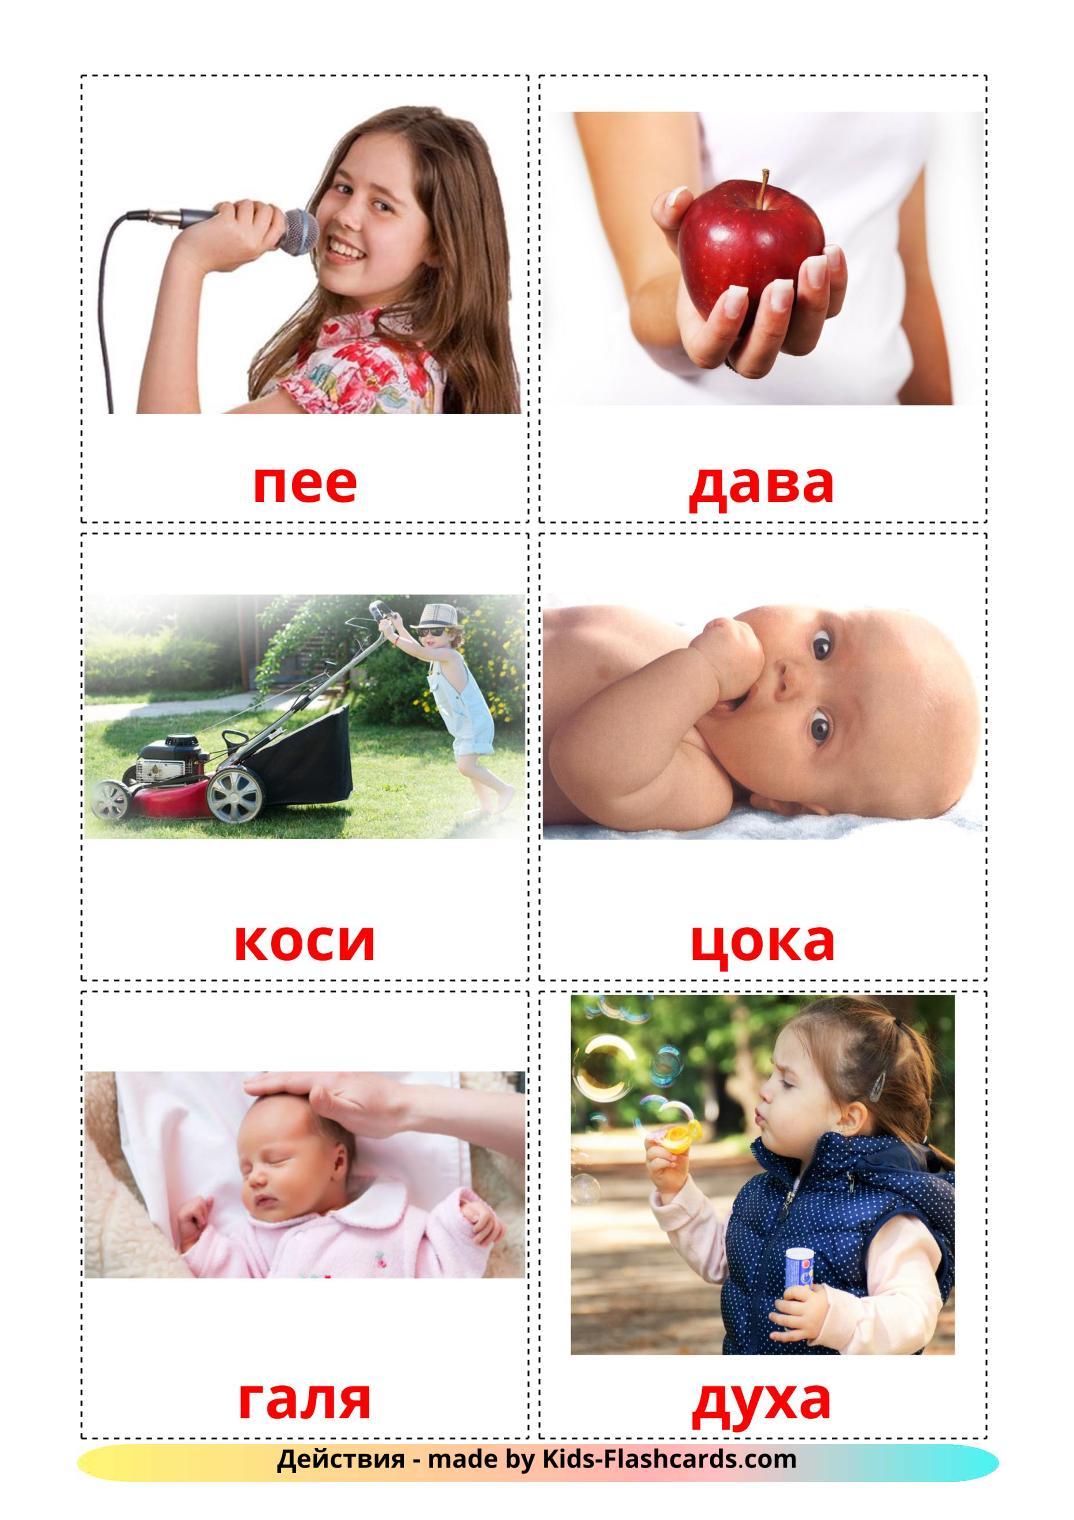 Action verbs - 55 Free Printable bulgarian Flashcards